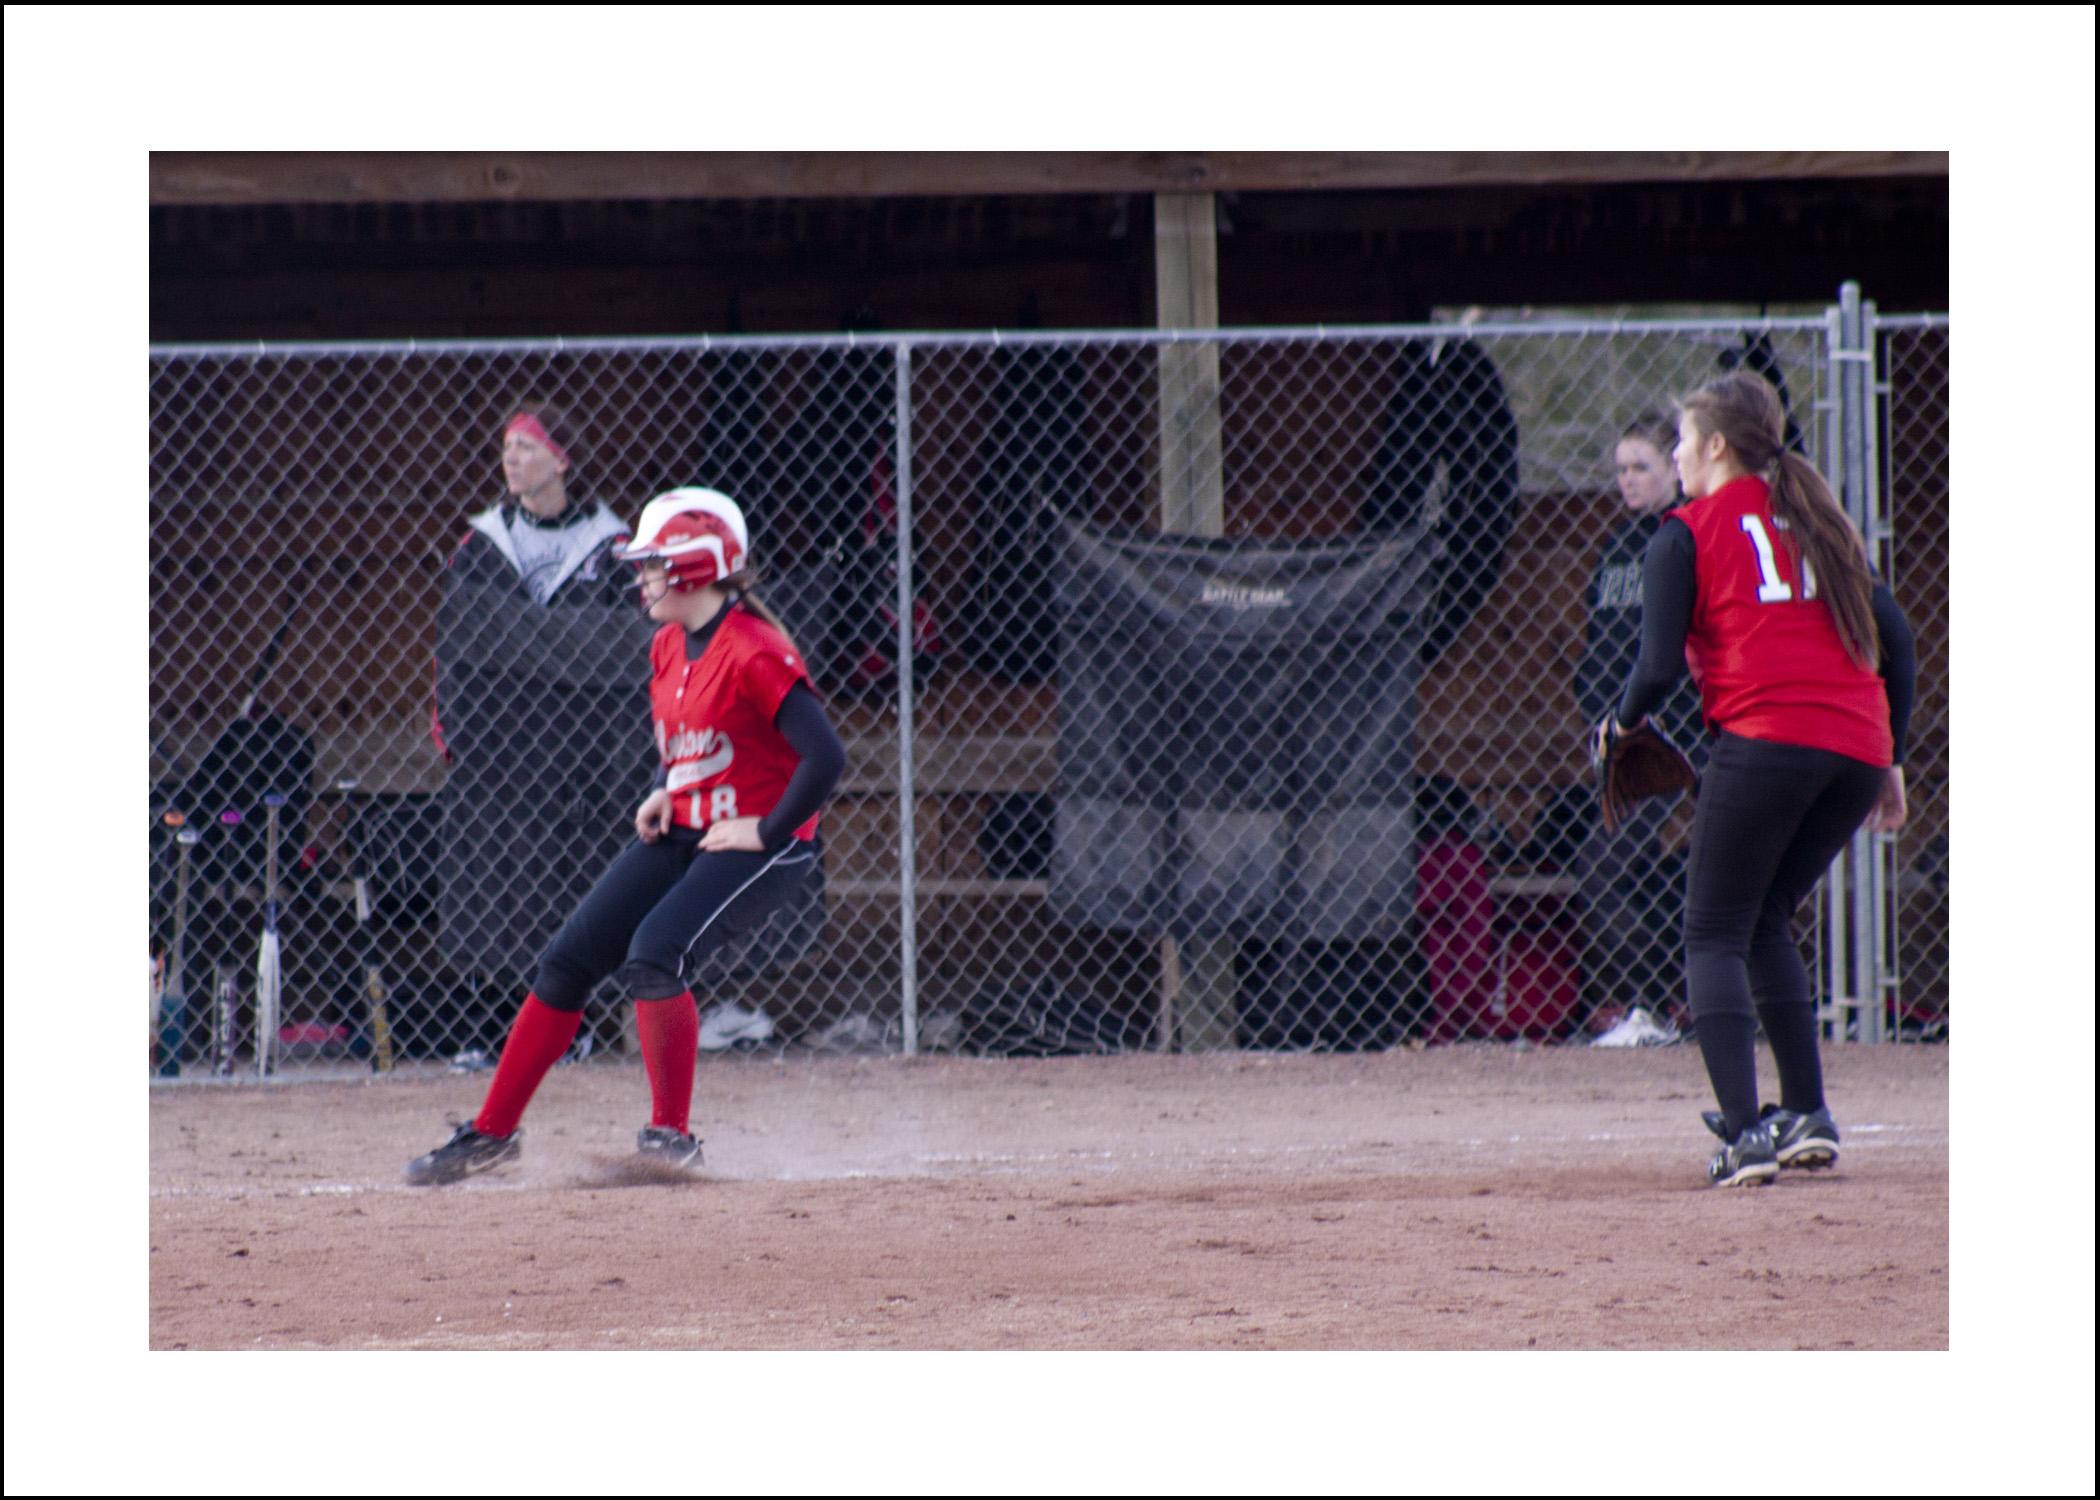 More Softball